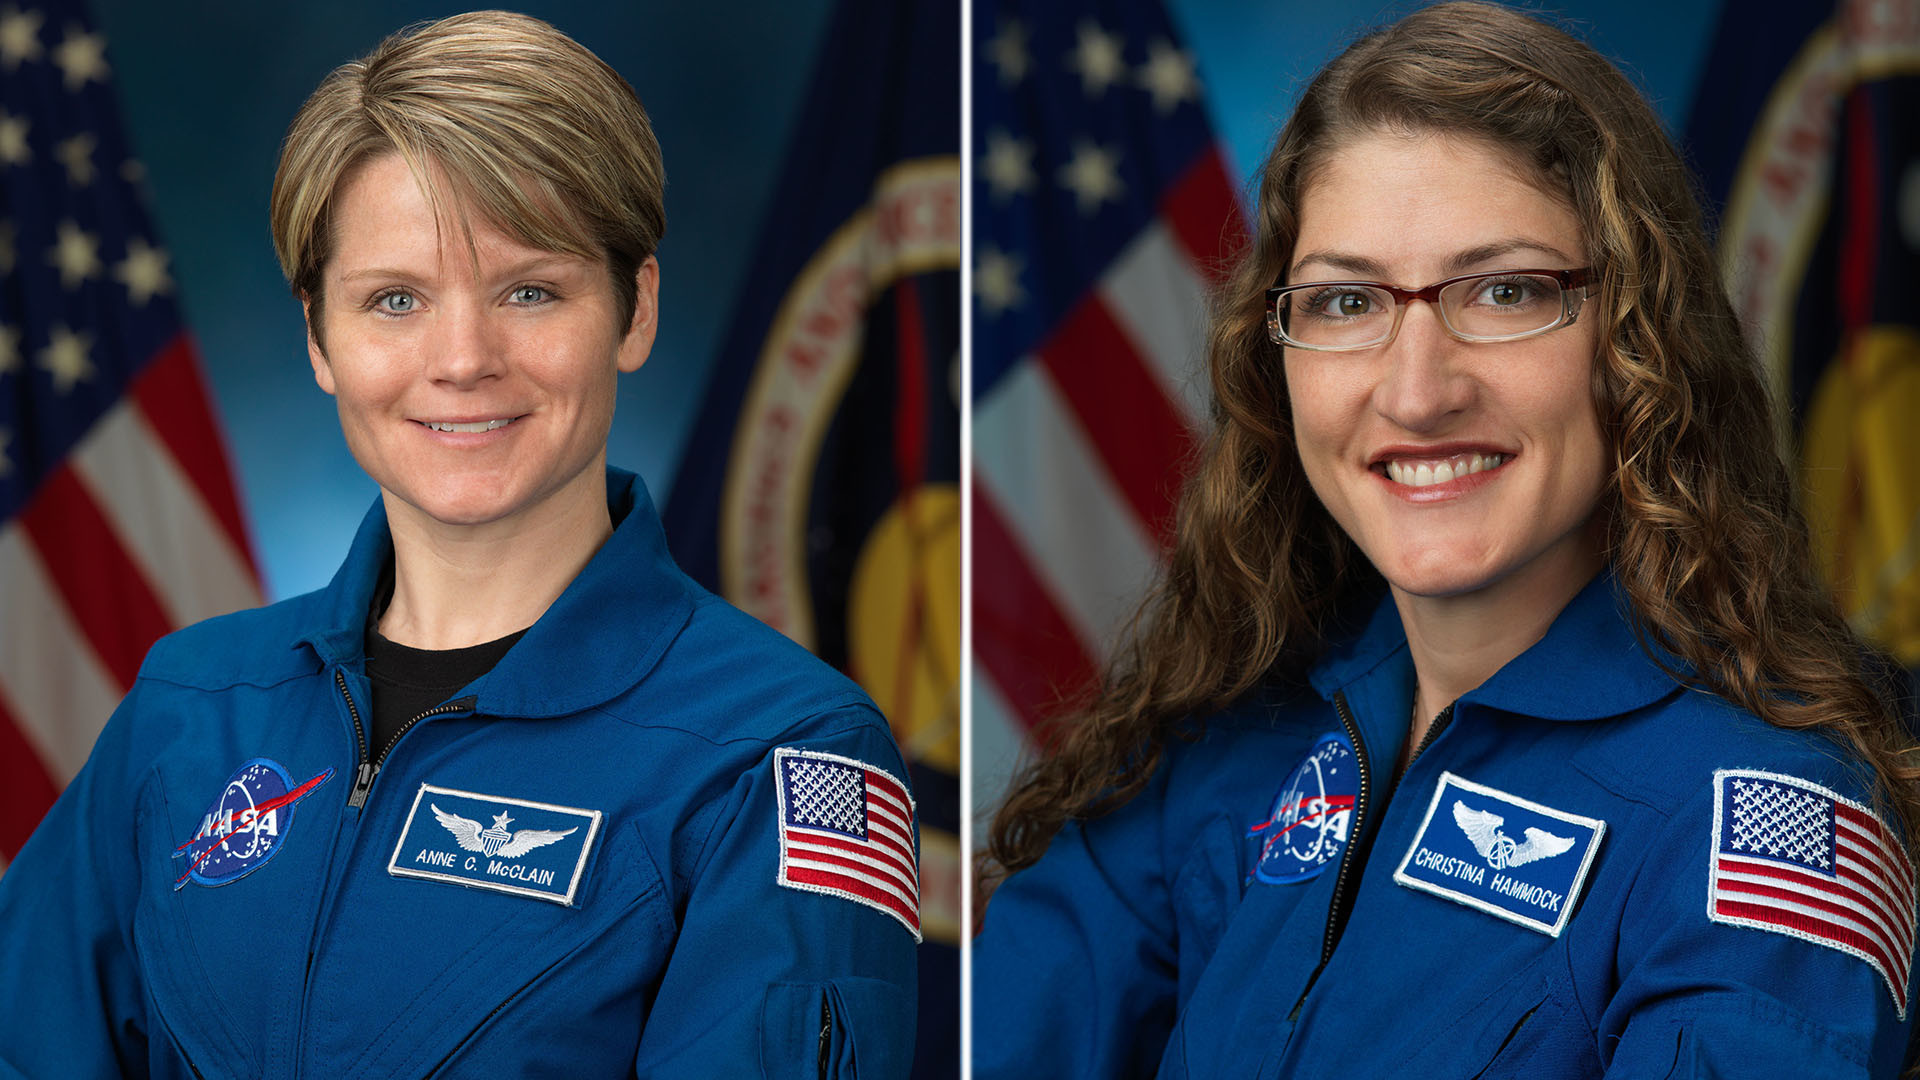 NASA's first all-female spacewalk isn't happening. Blame a wardrobe malfunction.